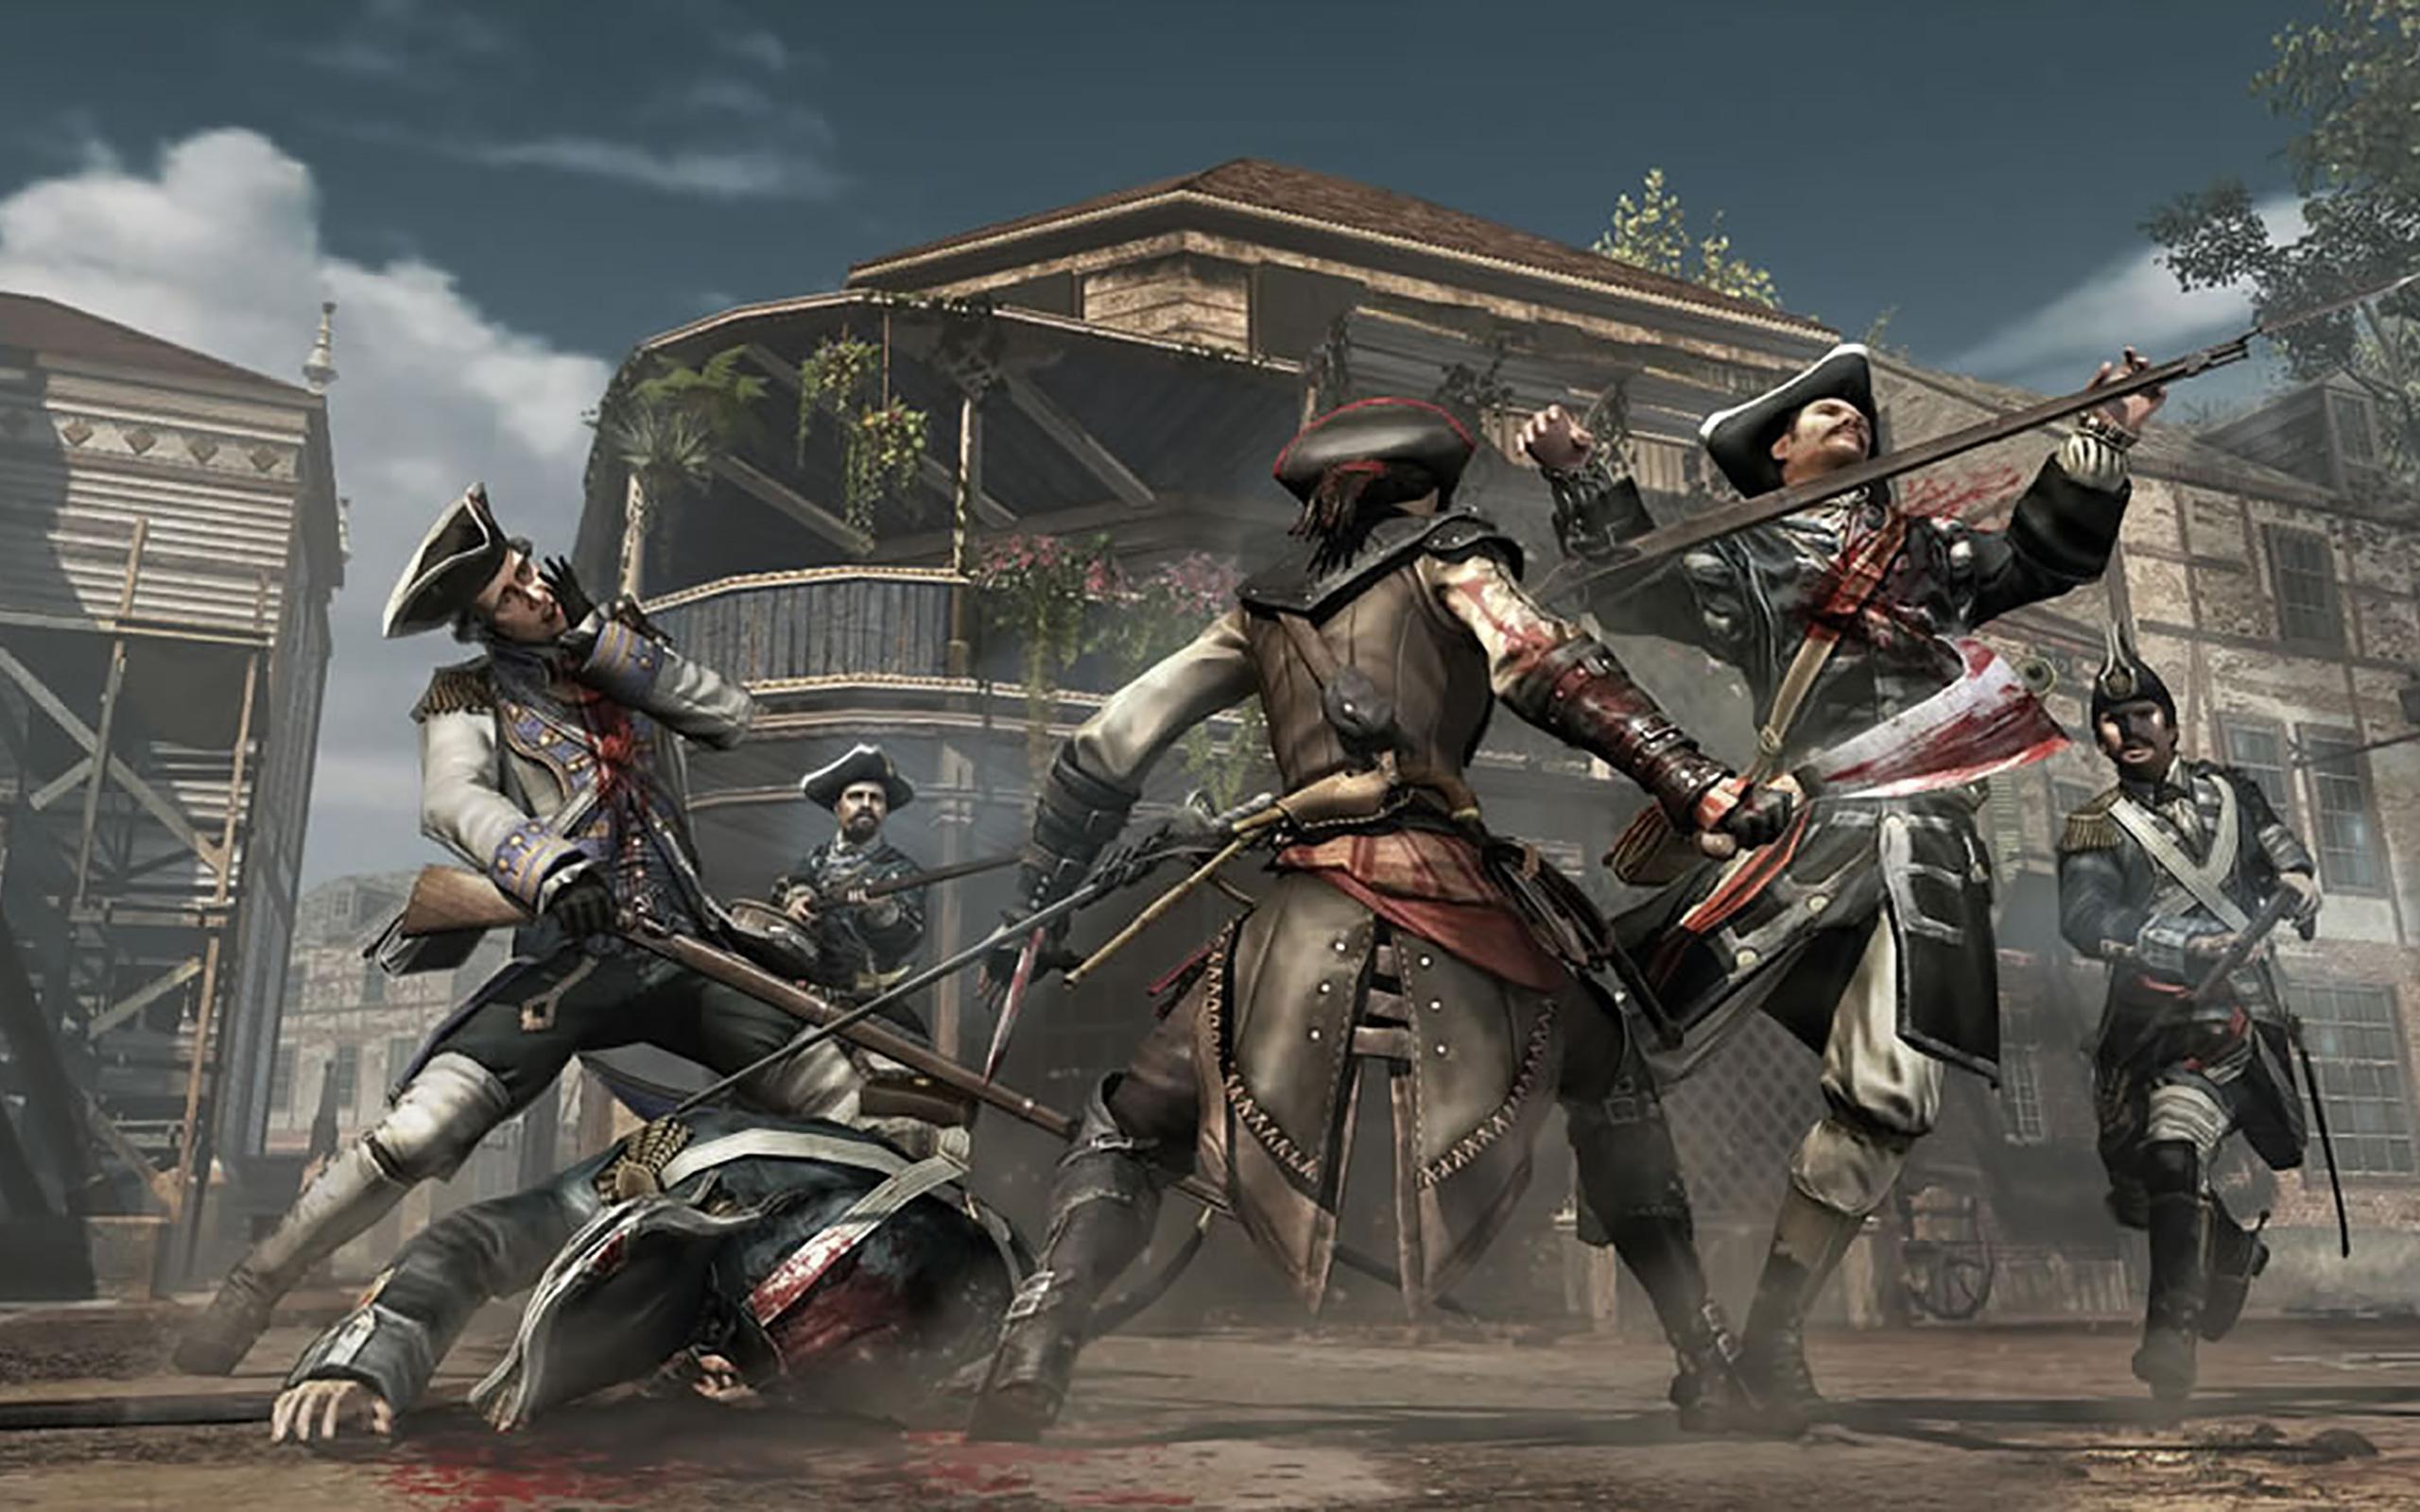 Assassin's Creed 3: Liberation / Ubisoft